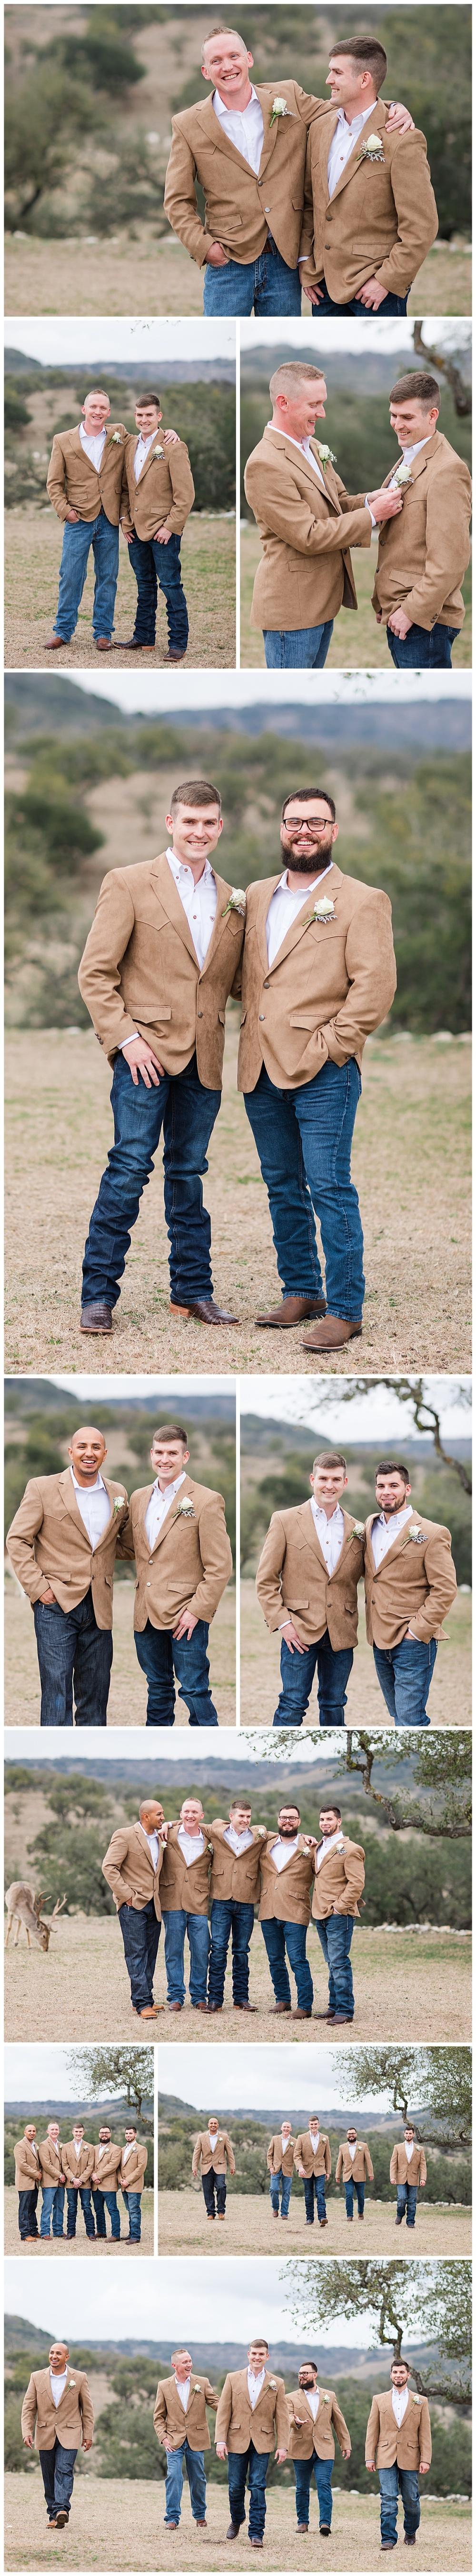 Wedding-Photographer-Texas-Hill-Country-Happy-H-Ranch-Comfor-Texas-Carly-Barton-Photography_0014.jpg